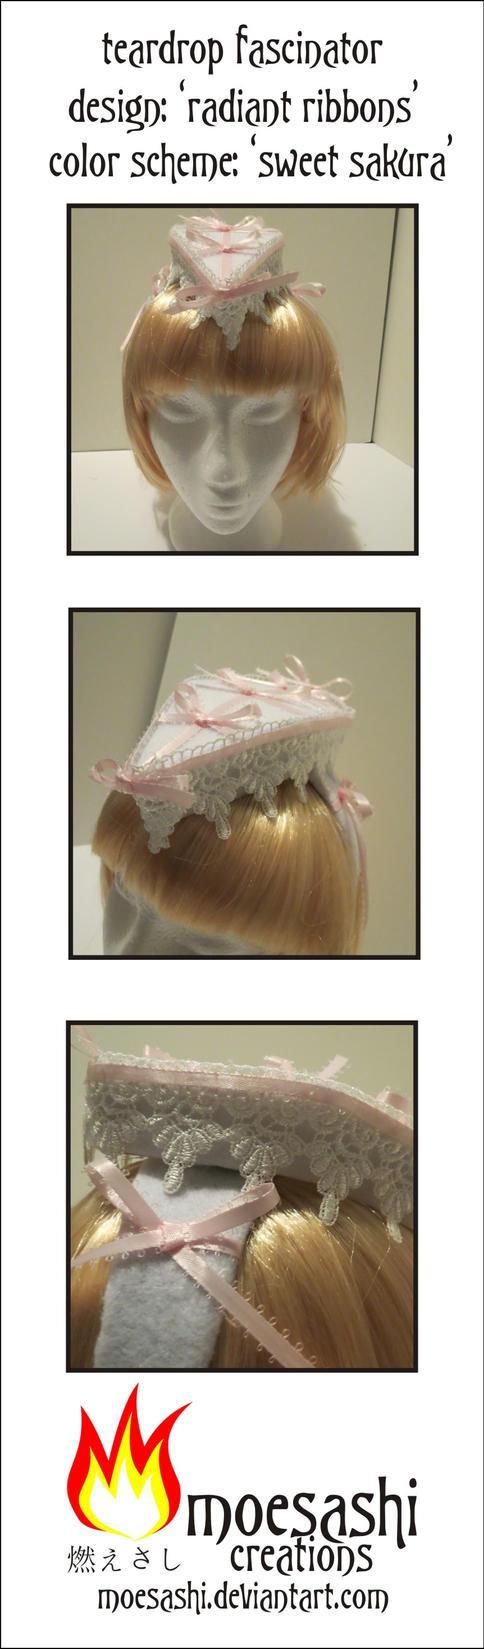 'Radiant Ribbons' in 'Sweet Sakura' by moesashi